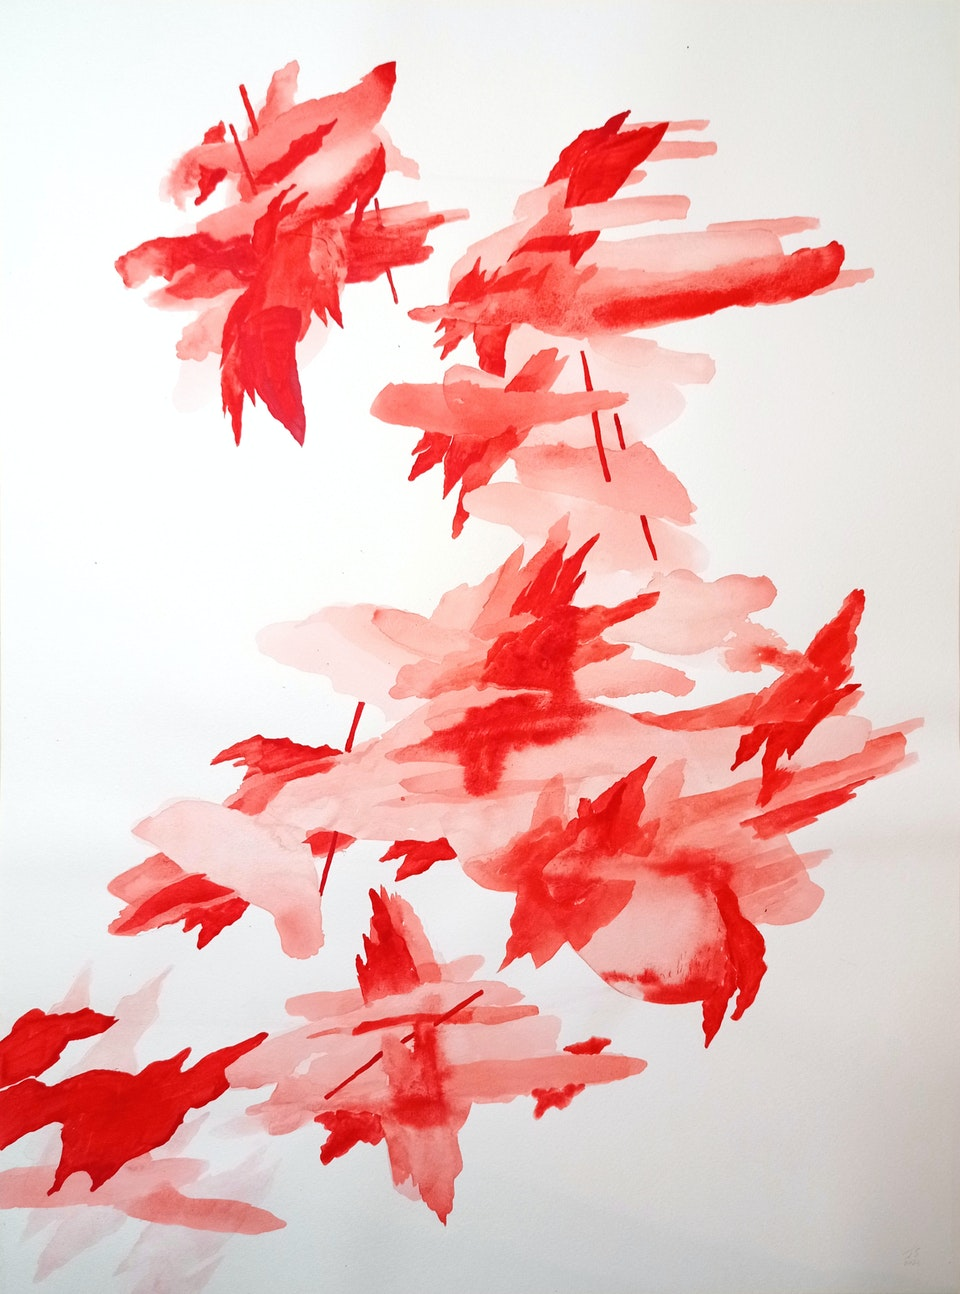 Blaze VI_2021_Justin Southey - Justin Southey 2021 Blaze VI Acrylic ink on paper 75cm x 55cm  ZAR 20 500